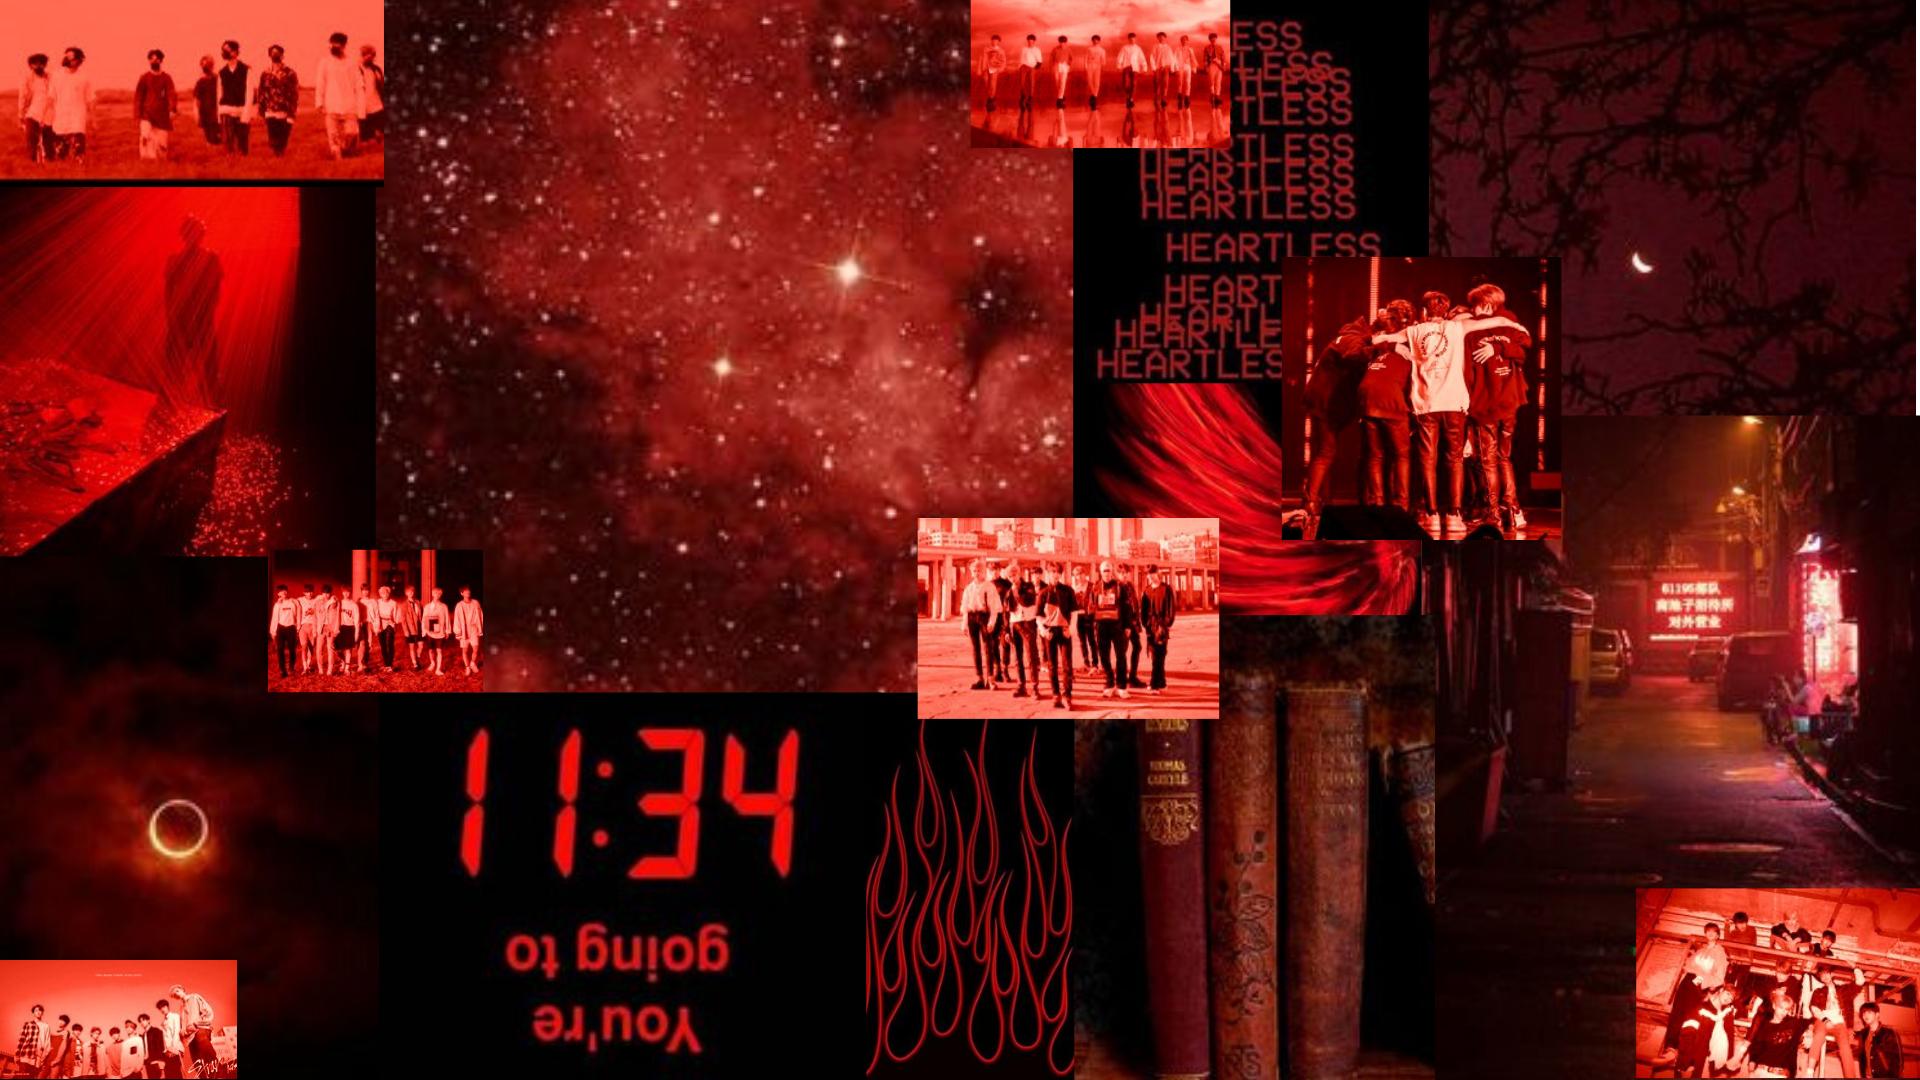 Stray Kids Dark Red Aesthetic Desktop Wallpaper Collage By Reia In 2020 Aesthetic Desktop Wallpaper Desktop Wallpaper Red Aesthetic